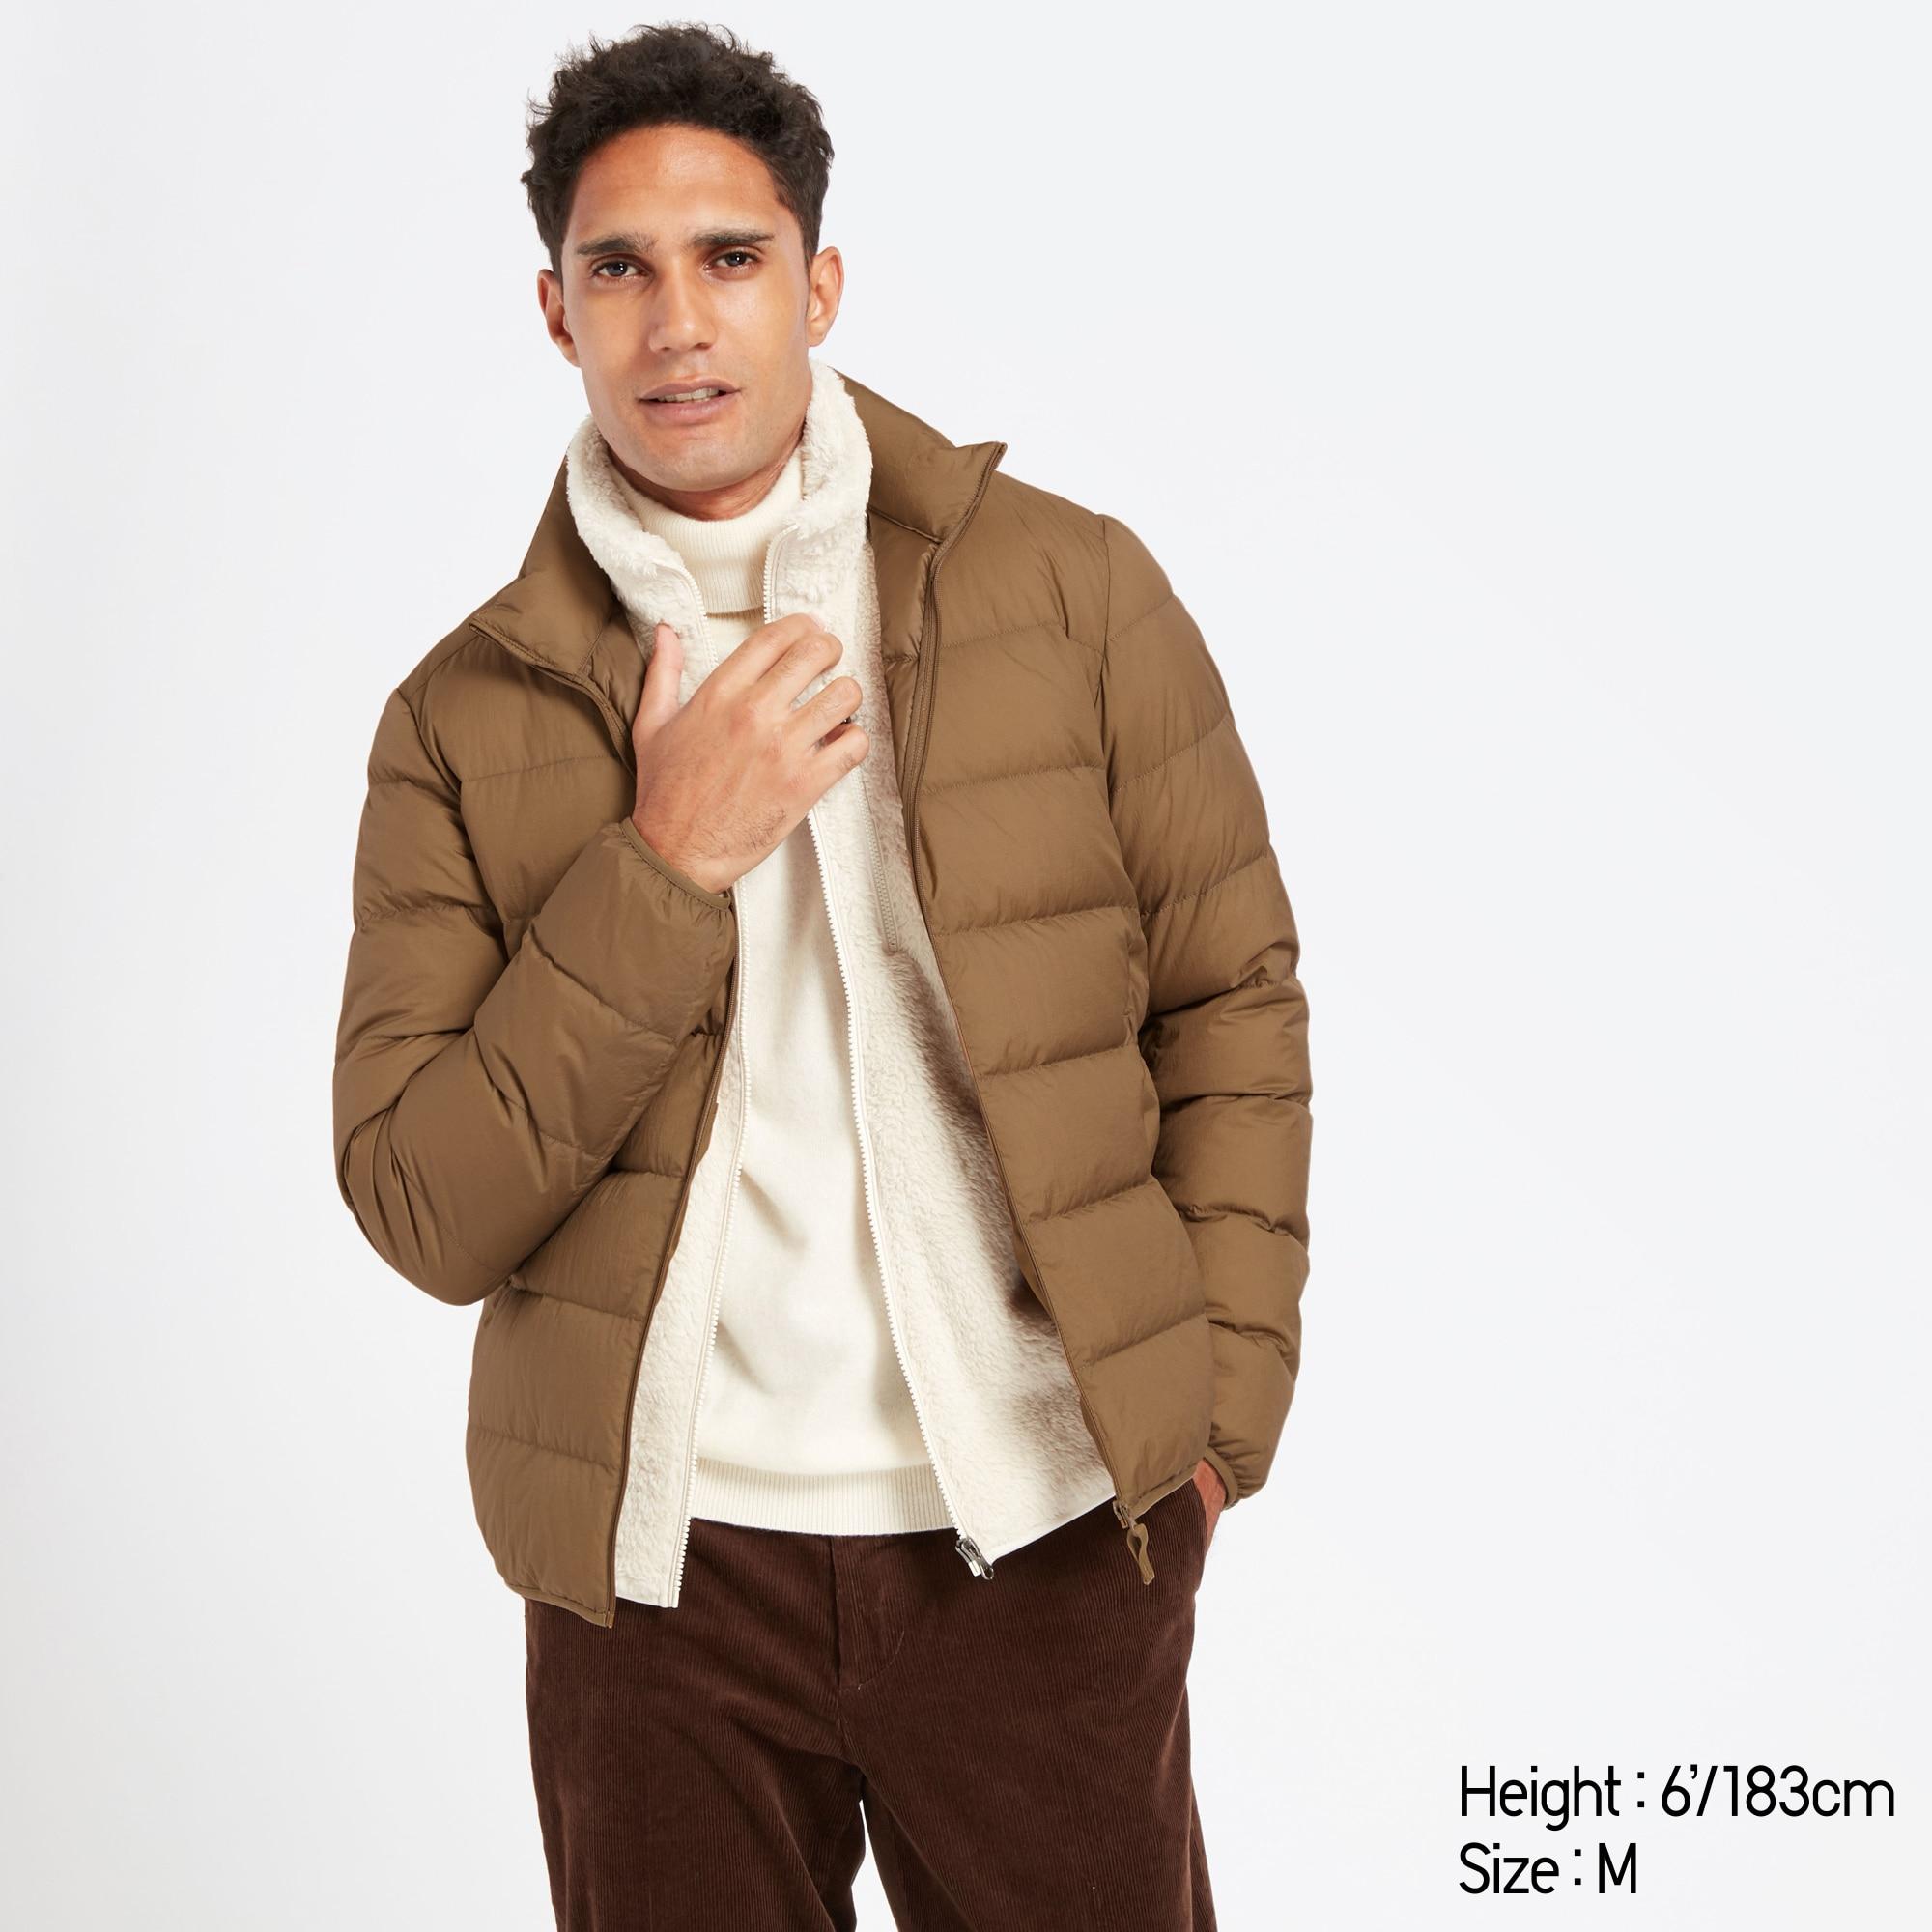 UNIQLO Ultra Light Down Jacket, verstaubar in mitgeliefertem Beutel heute 20€ reduziert - Frauen- & Herrenmodelle